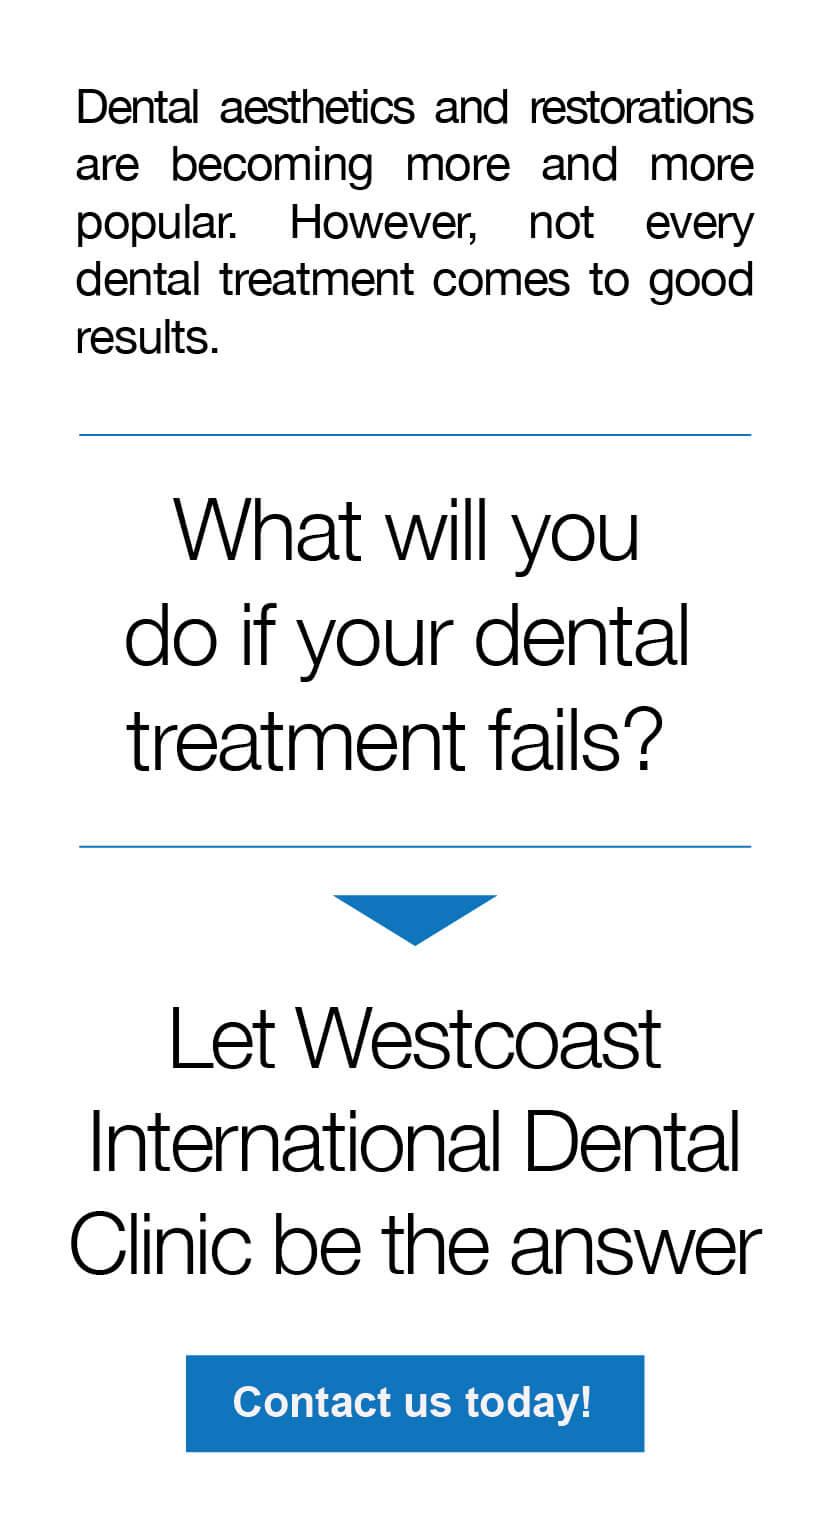 westcoasts-international-dental-clinic-introduction